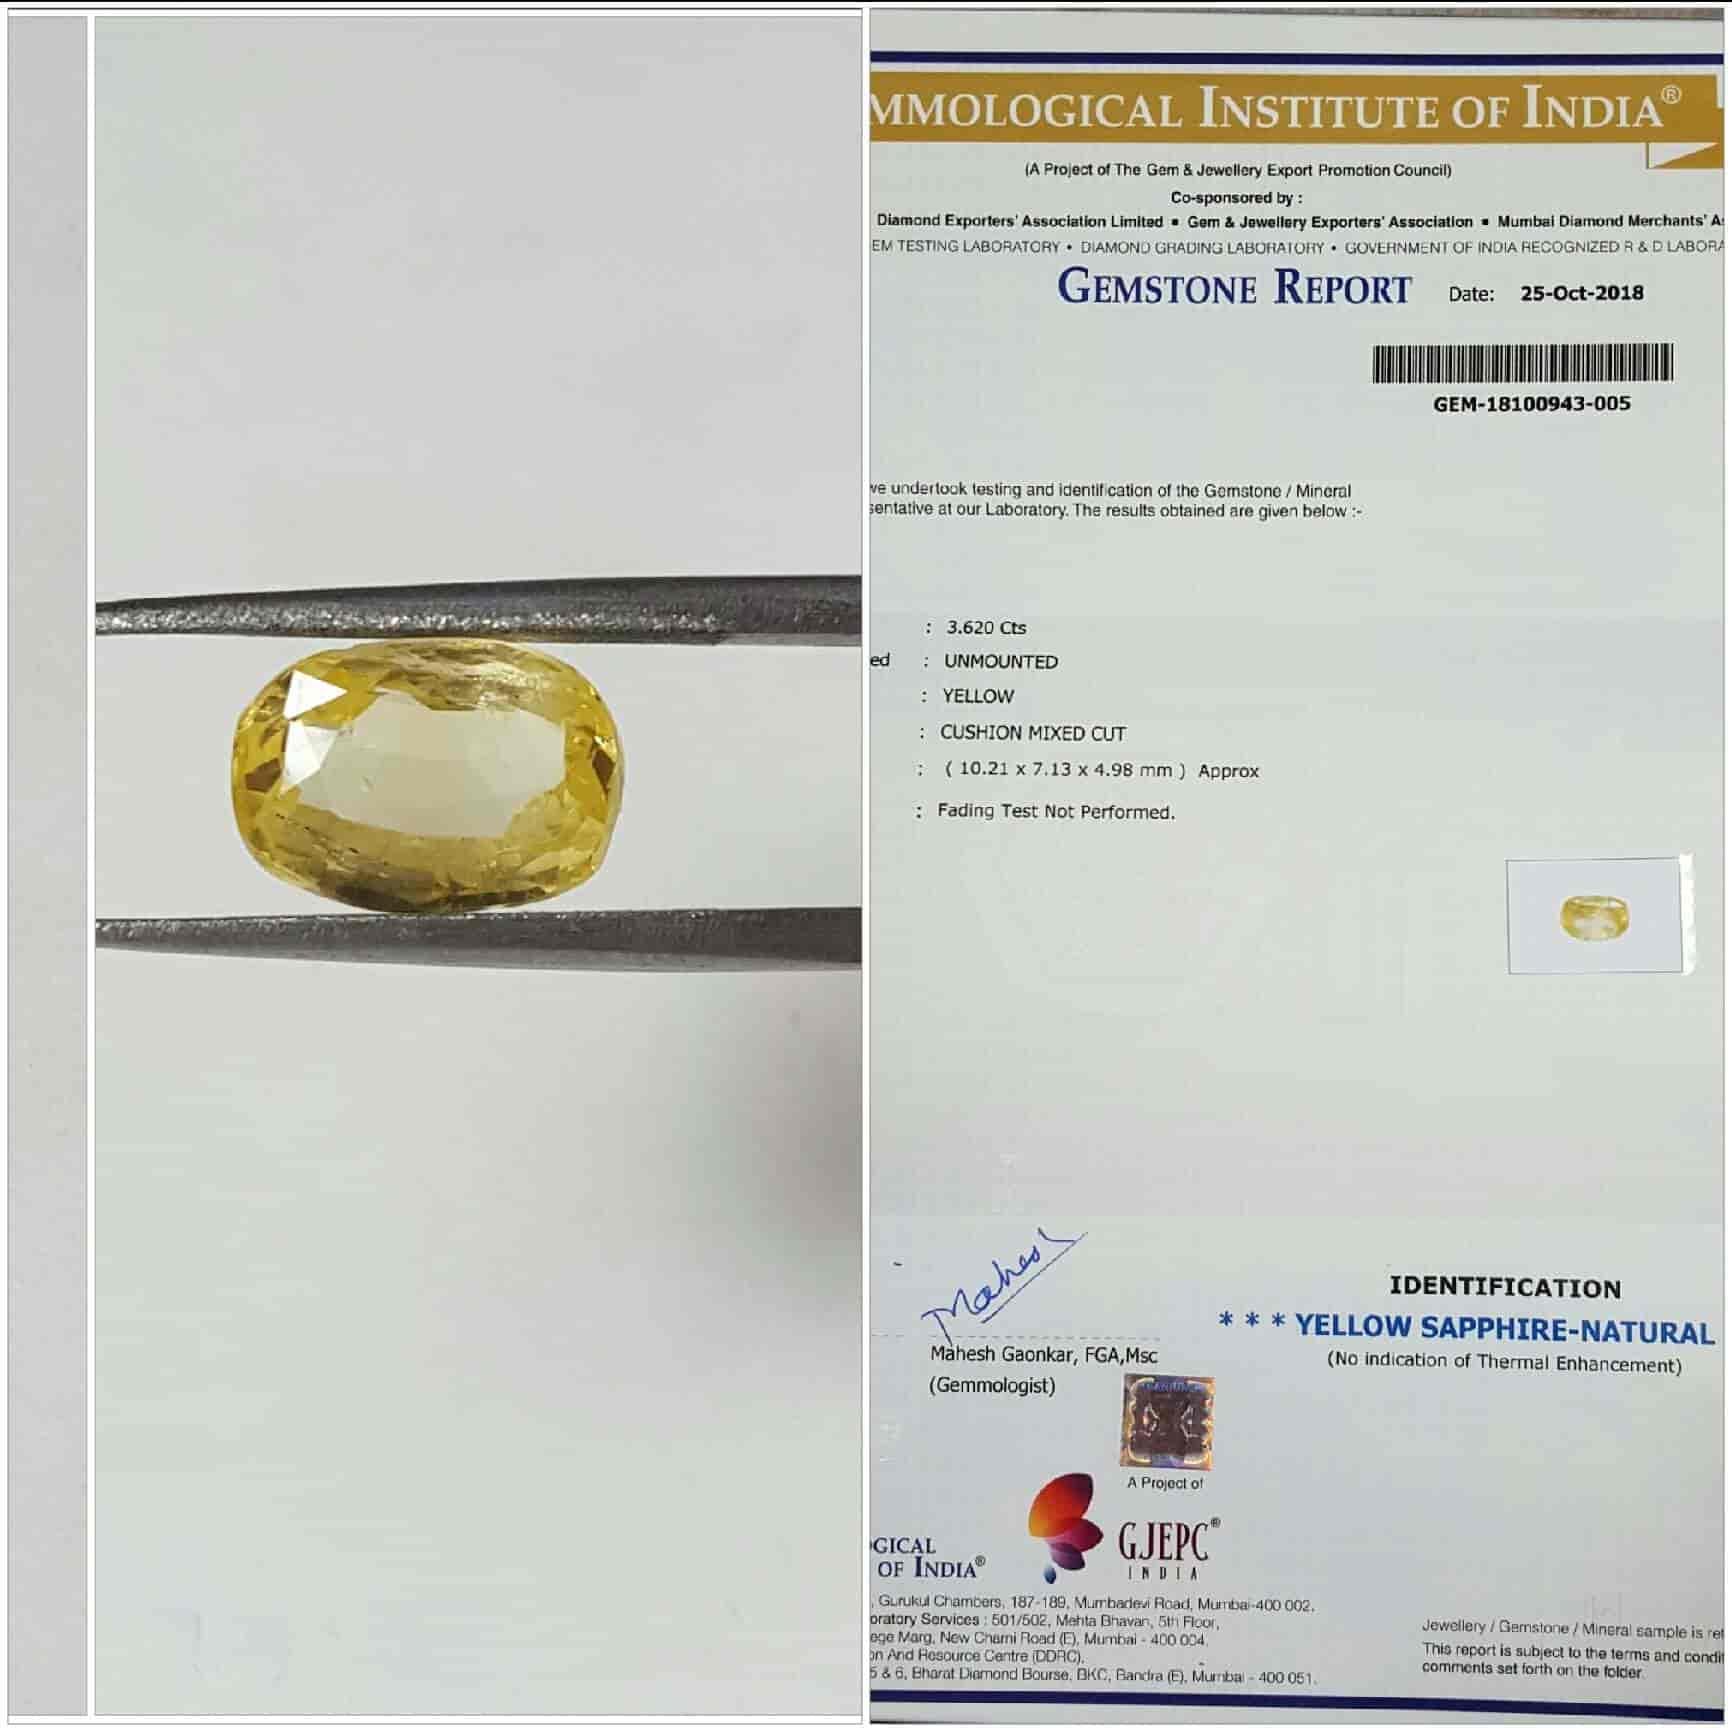 Ultra Gems Lab, Kalbadevi - Gem Dealers in Mumbai - Justdial